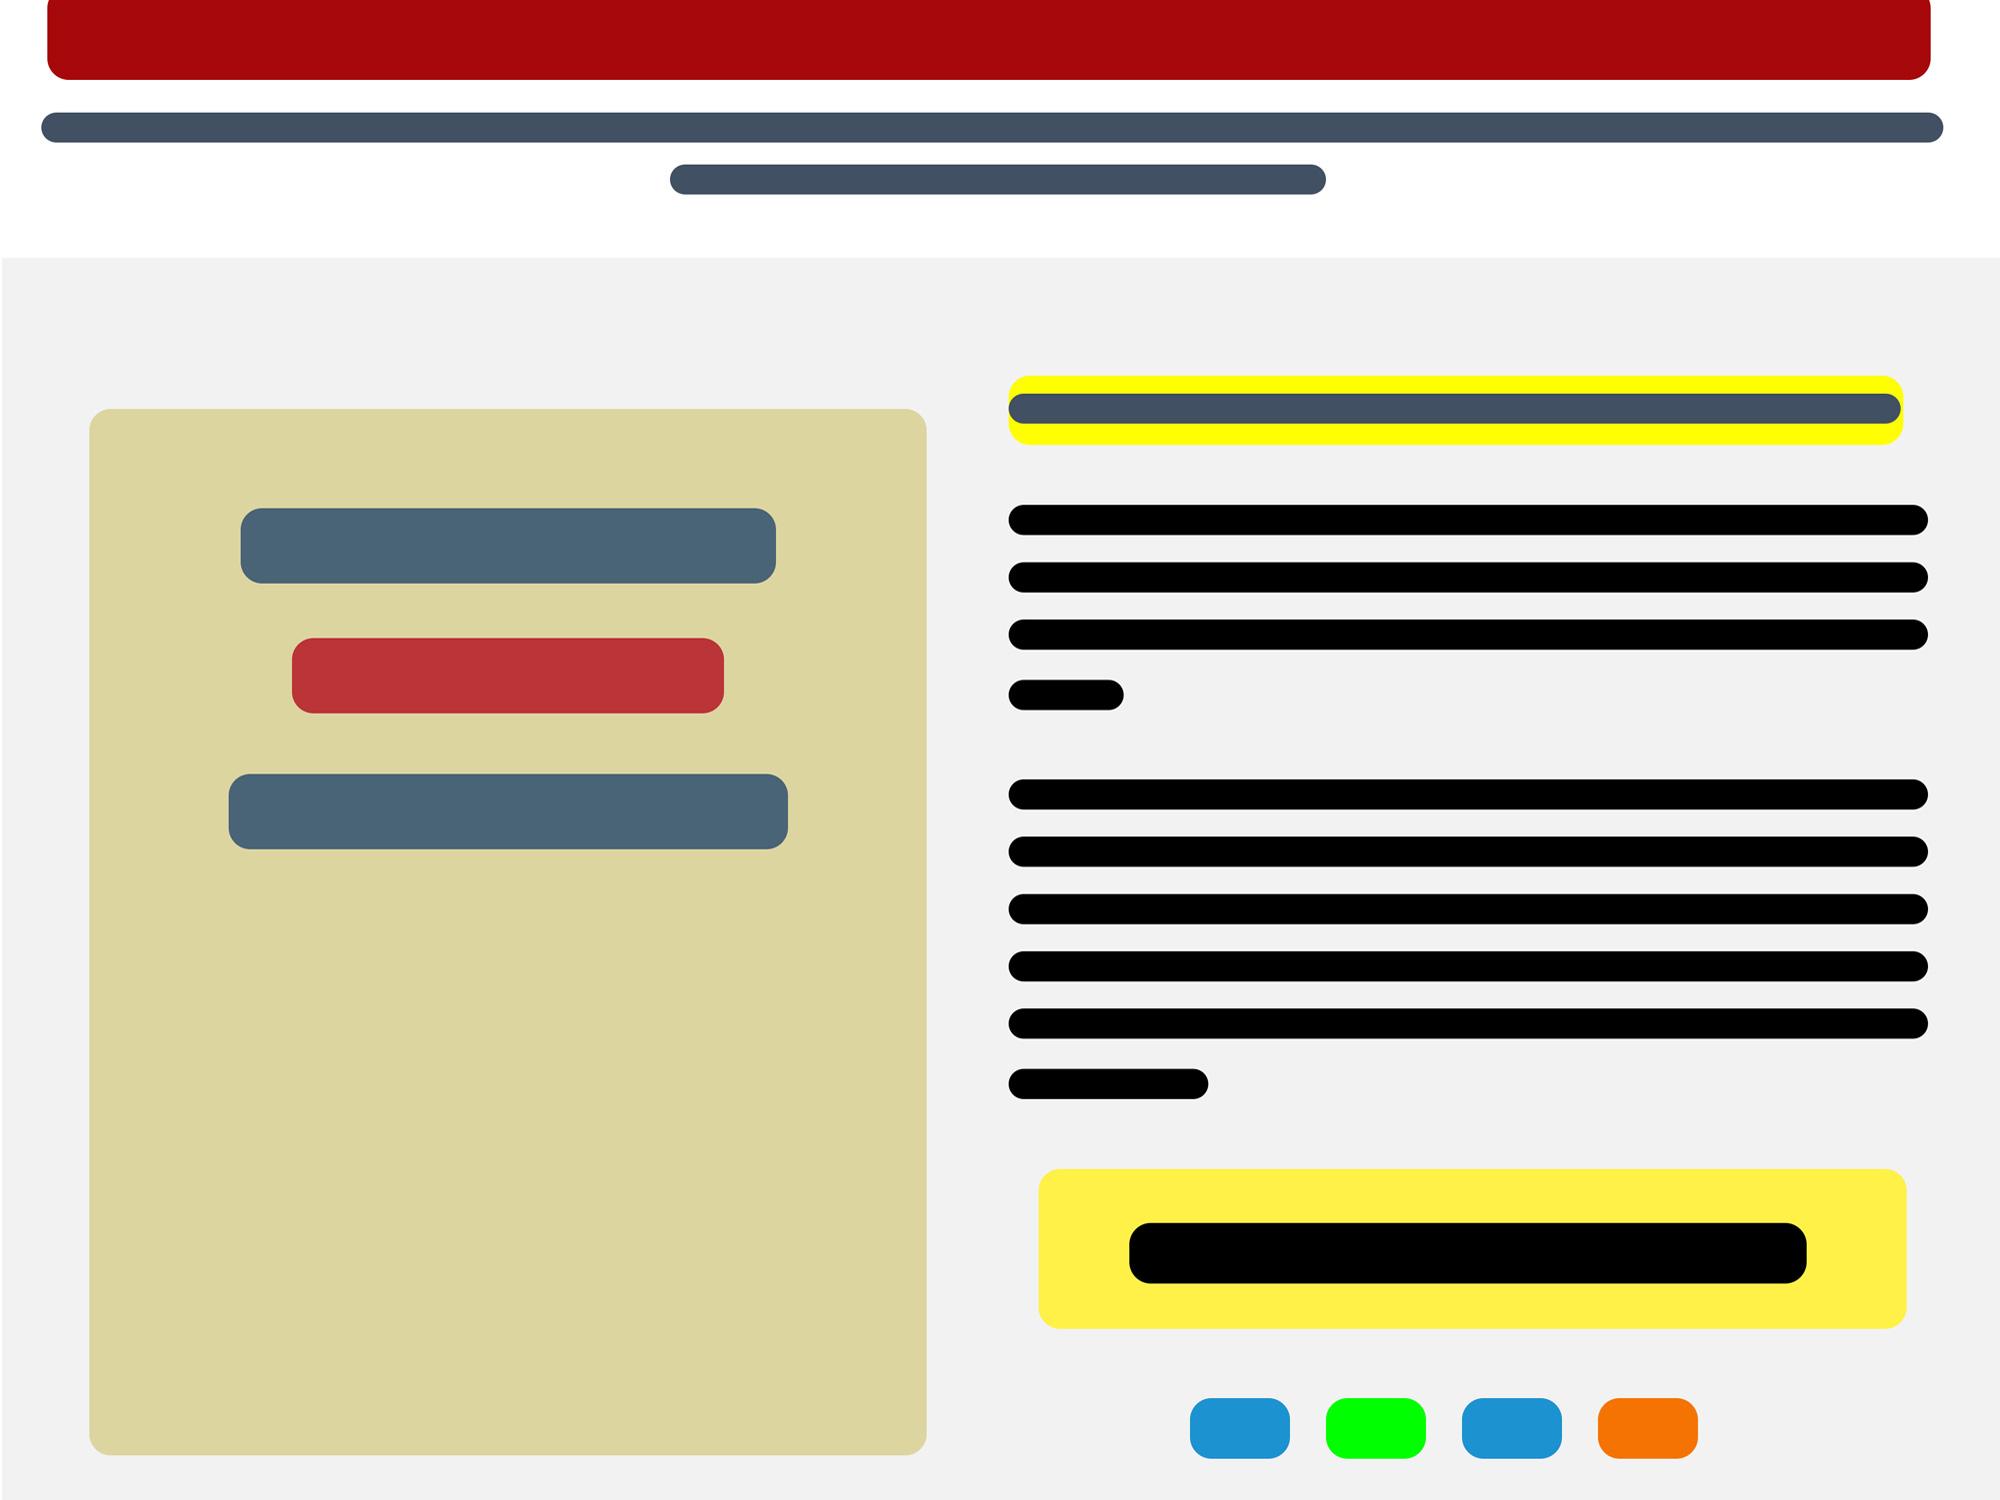 Pourquoi créer une landing page ciblée - Agence Sharing